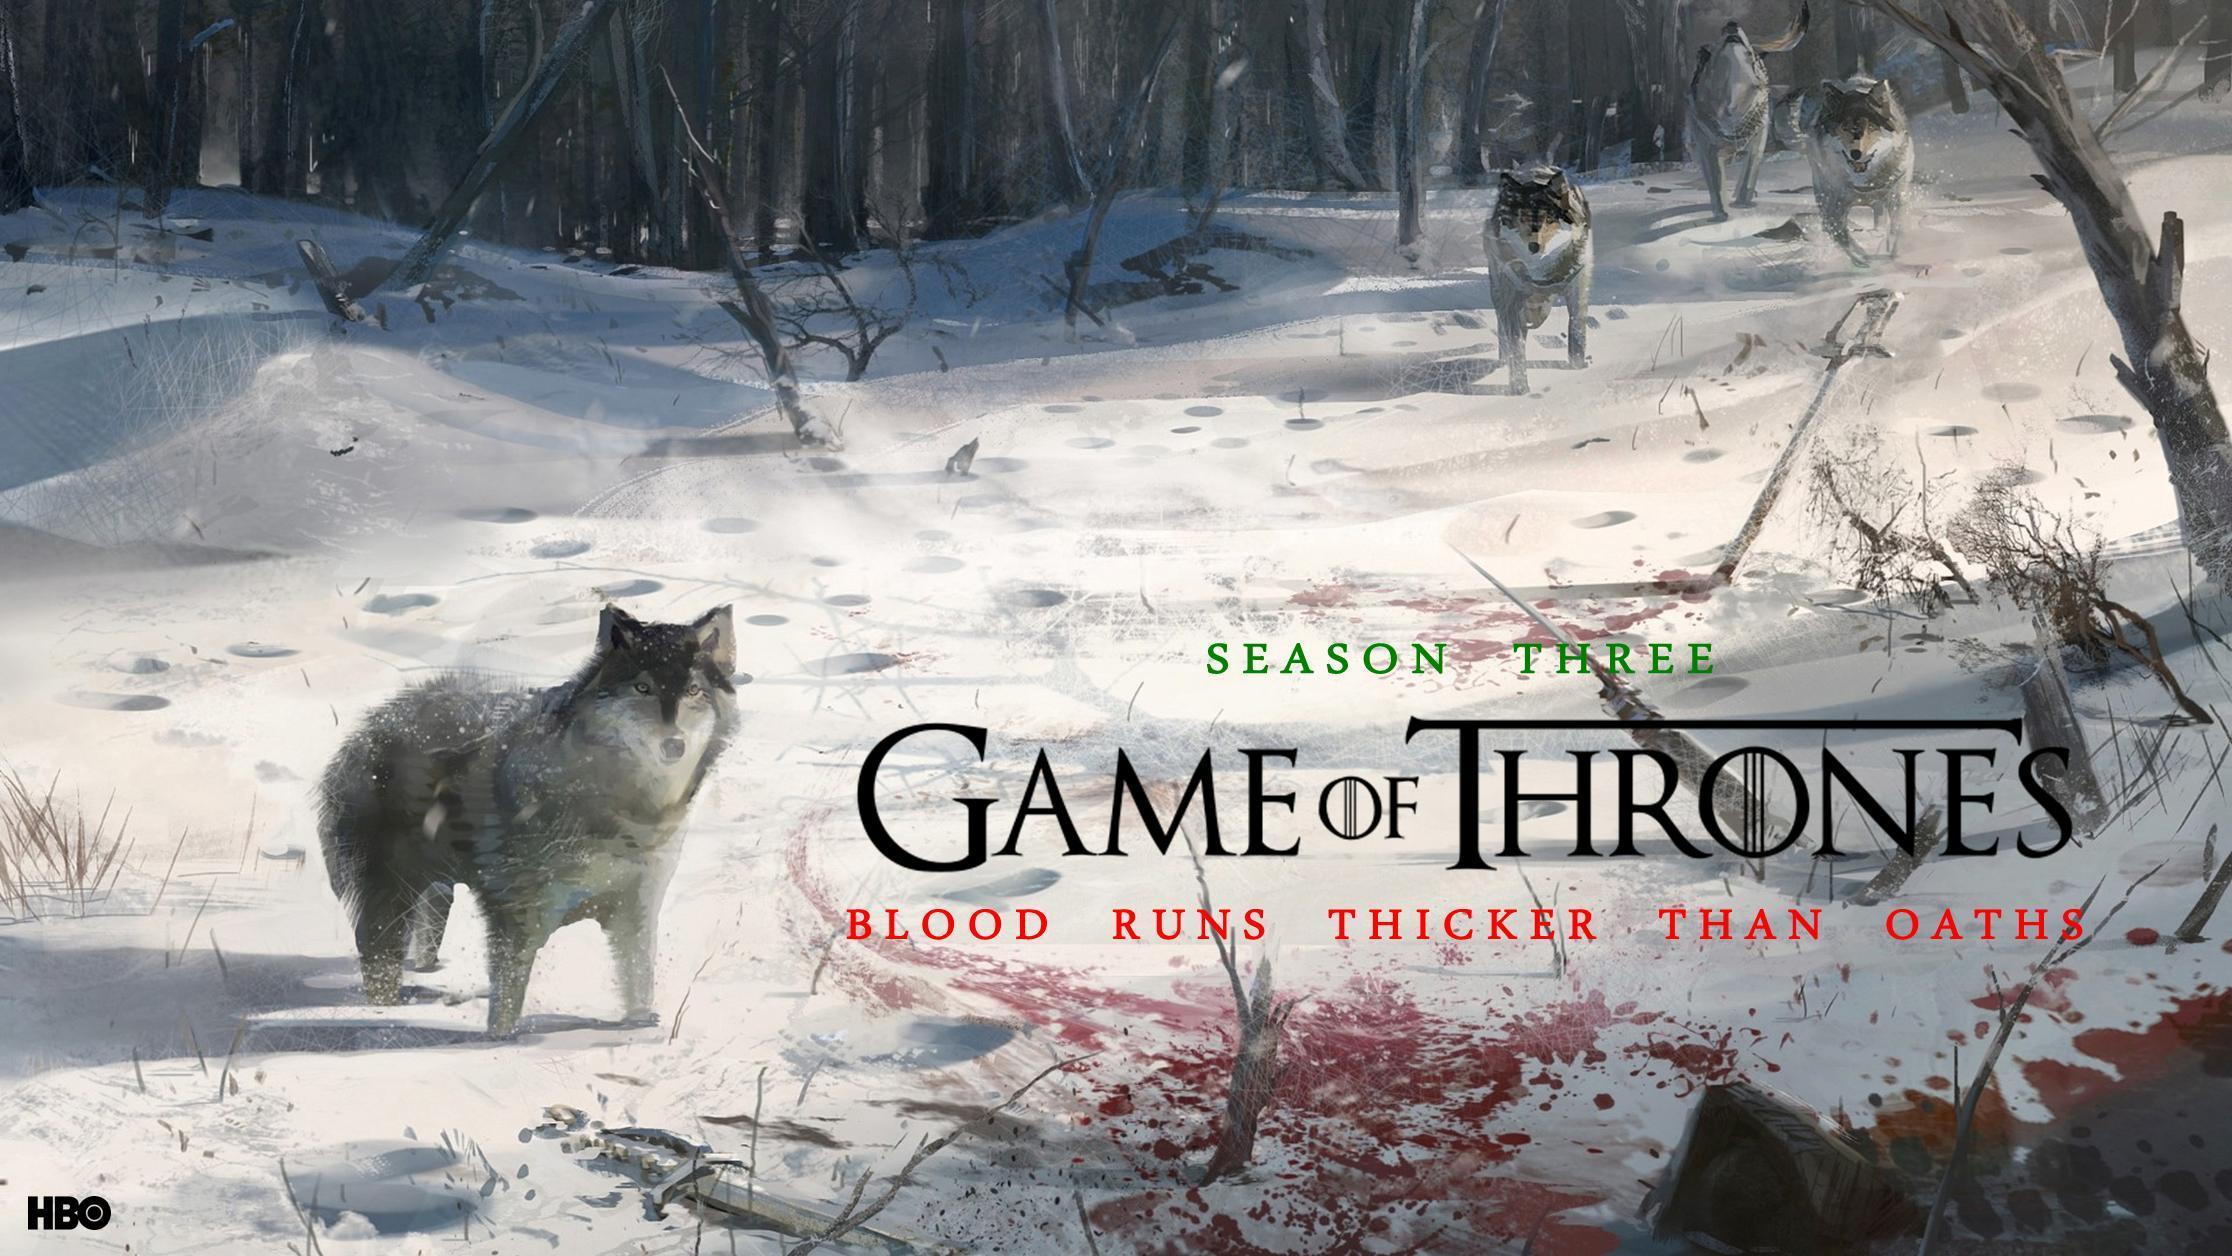 Game of Thrones Season 3 HD Wallpaper is a hi res Wallpaper 2232x1256